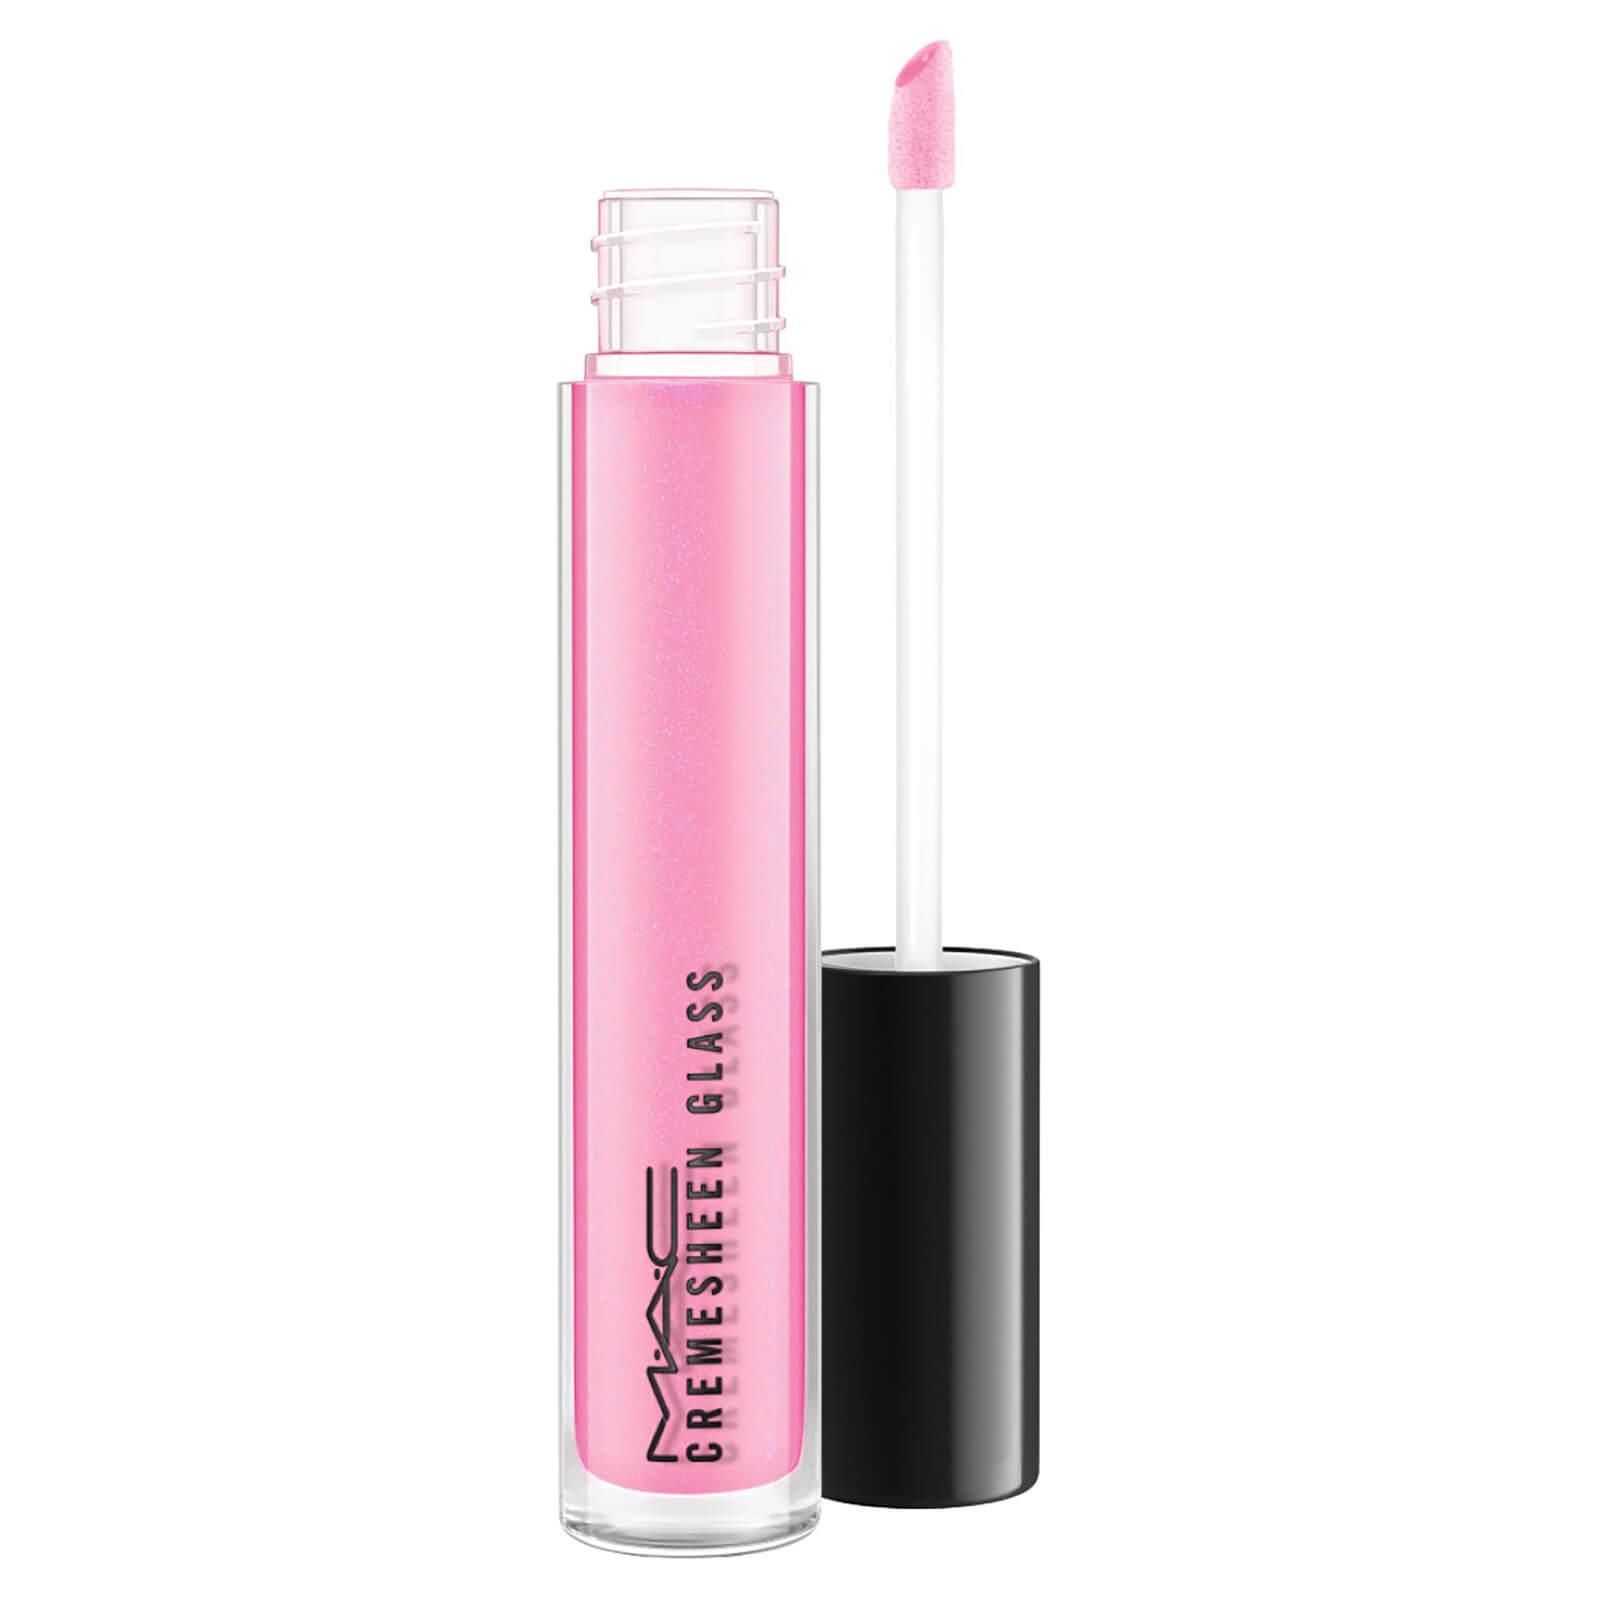 MAC Brillant à Lèvres Cremesheen Glass Lip Finish (teintes variées) - Pagoda